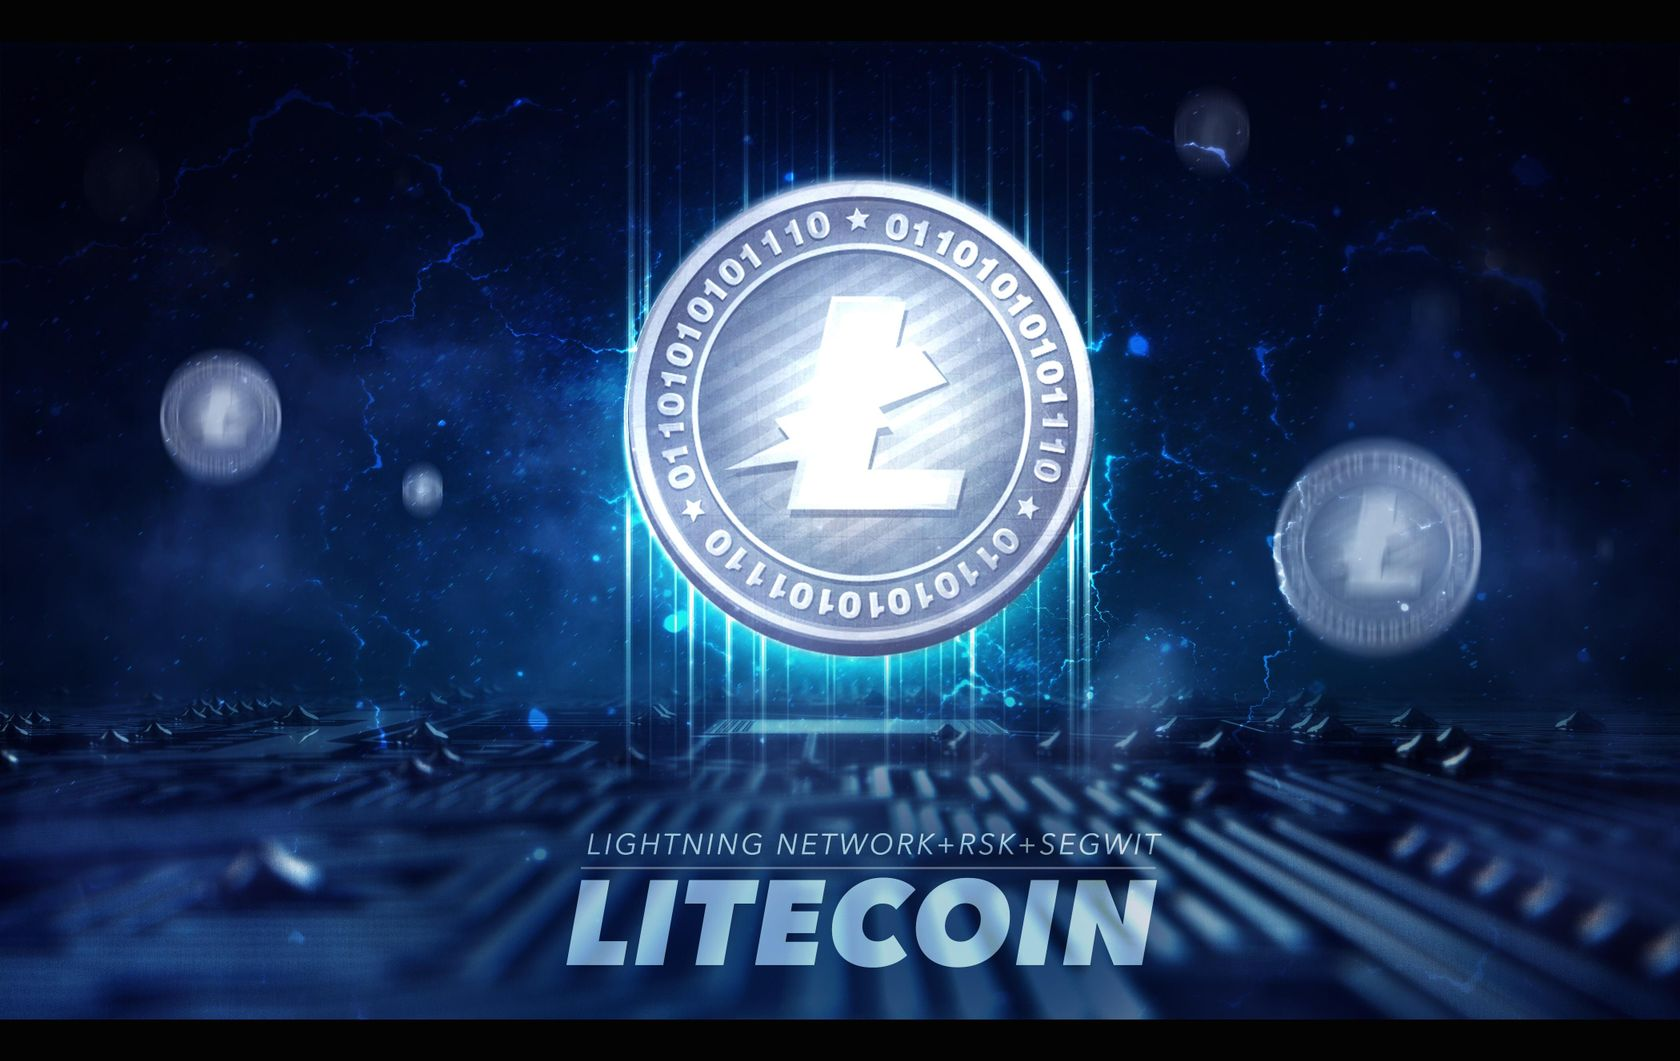 Почему растет цена на Litecoin (LTC)